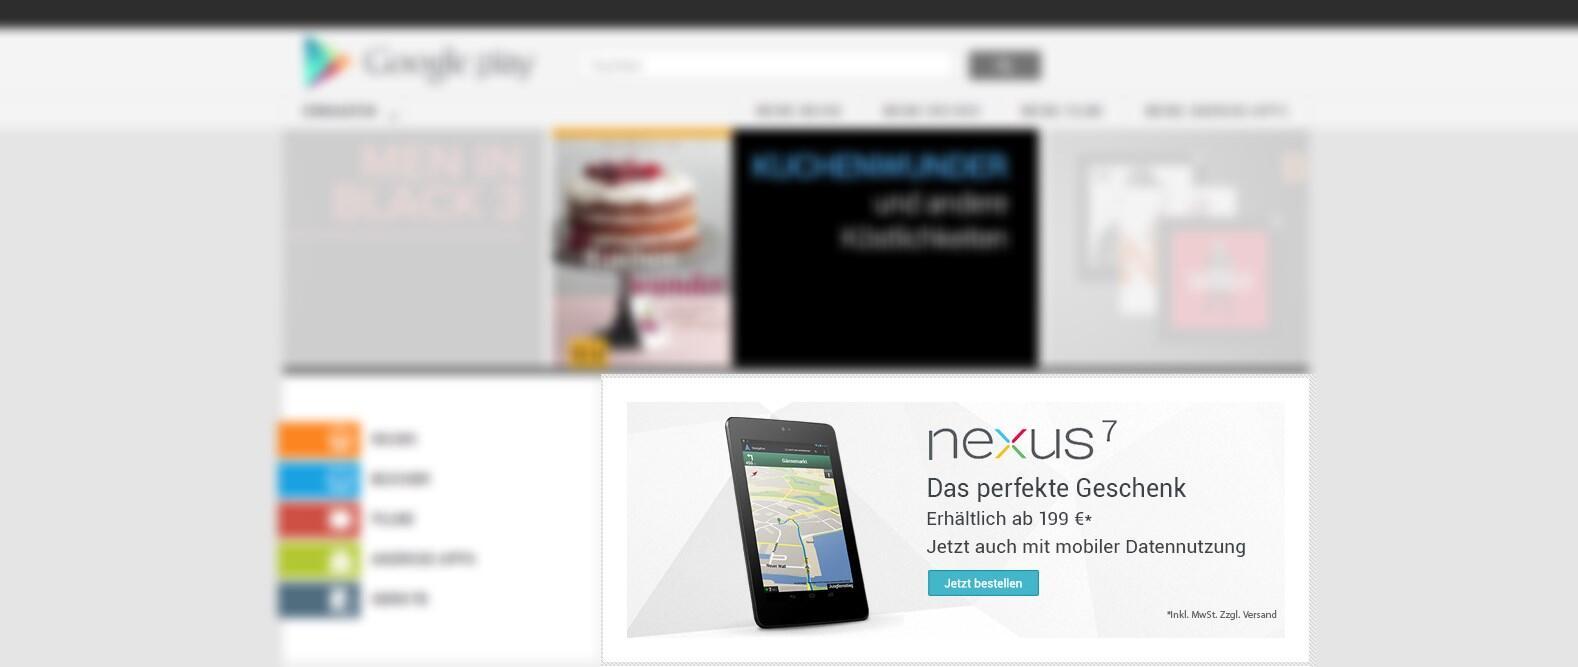 Android Asus Google LG Nexus 10 nexus 4 nexus 7 phone play Samsung tablet